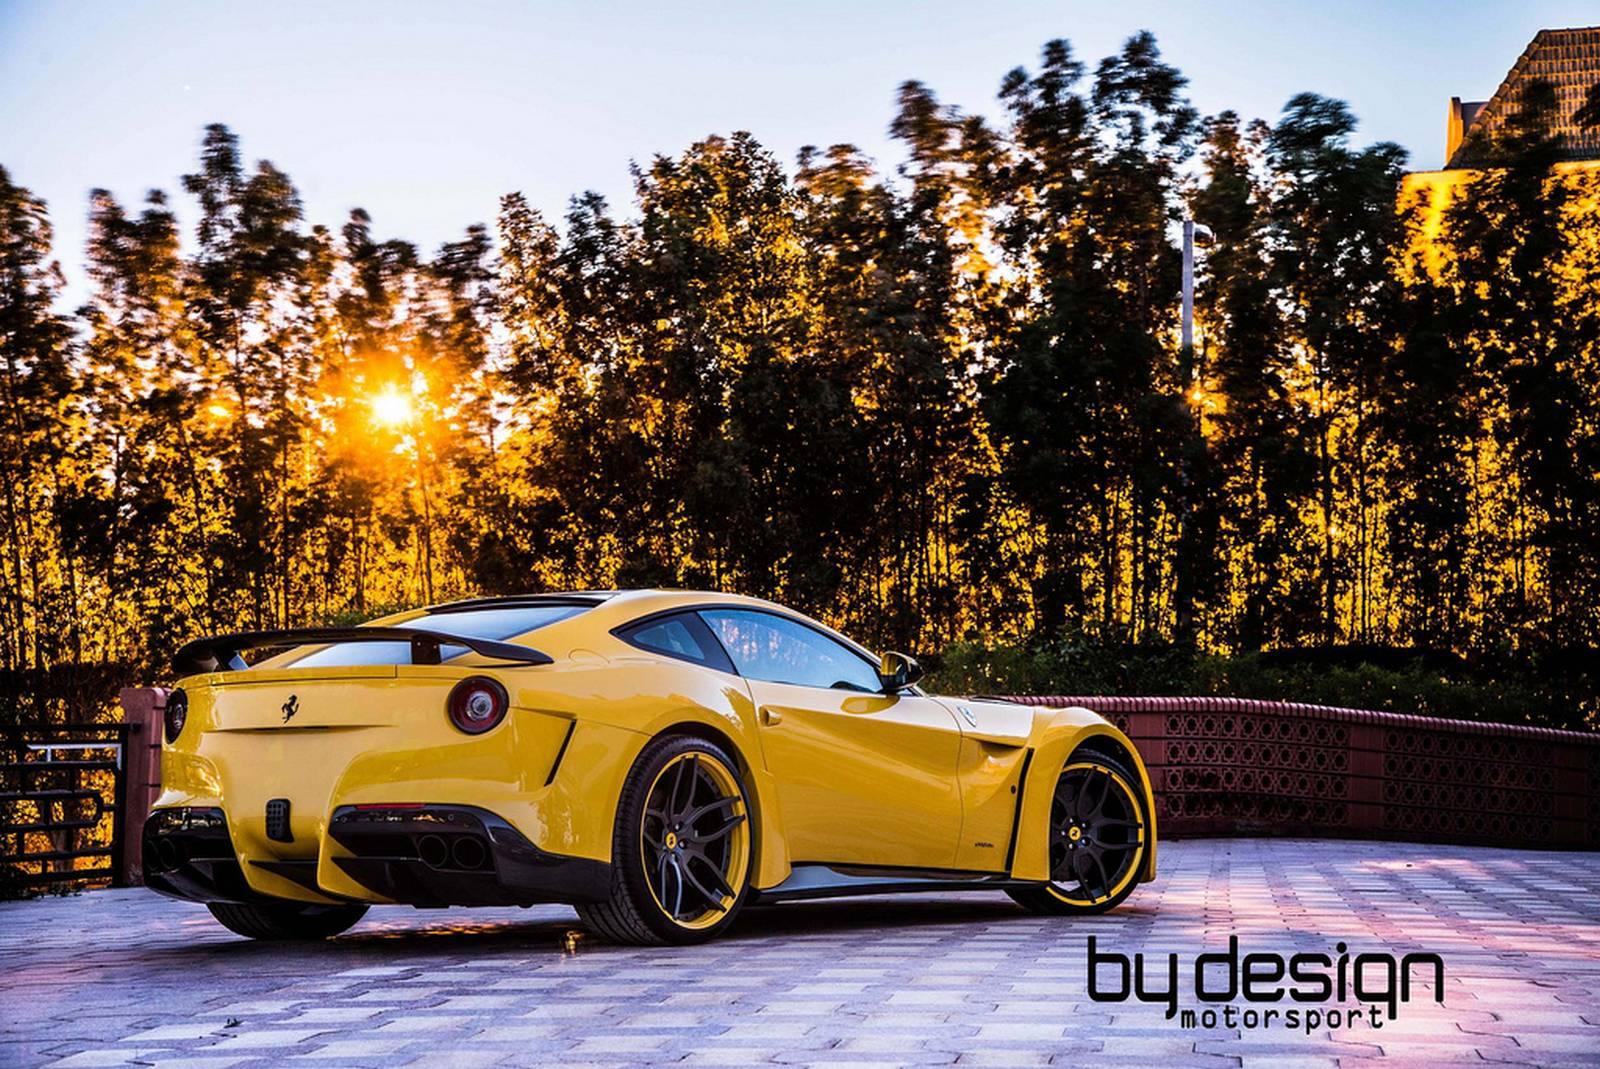 http://www.gtspirit.com/wp-content/gallery/yellow-novitec-n-largo-ferrari-f12/novitec-n-largo-ferrari-f12-14.jpg